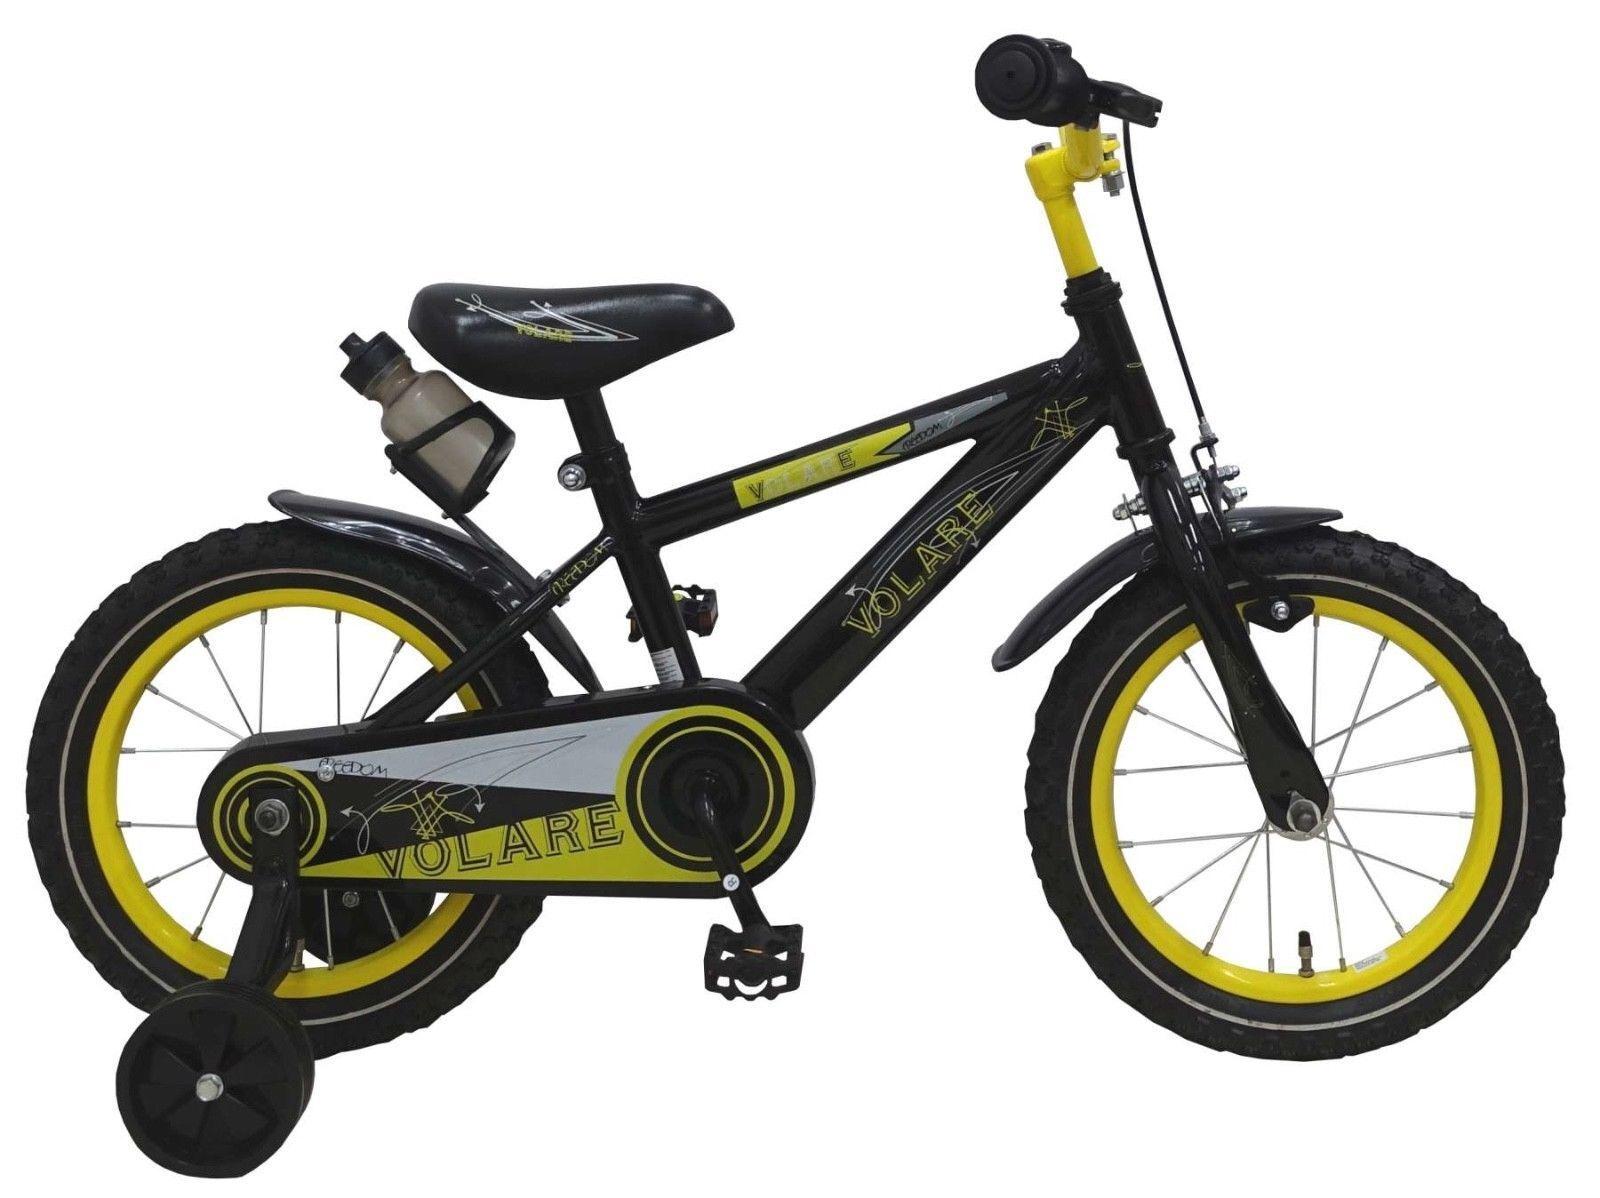 14 Zoll Fahrrad Rücktritt Stützräder Kinderfahrrad Jungen schwarz 81415